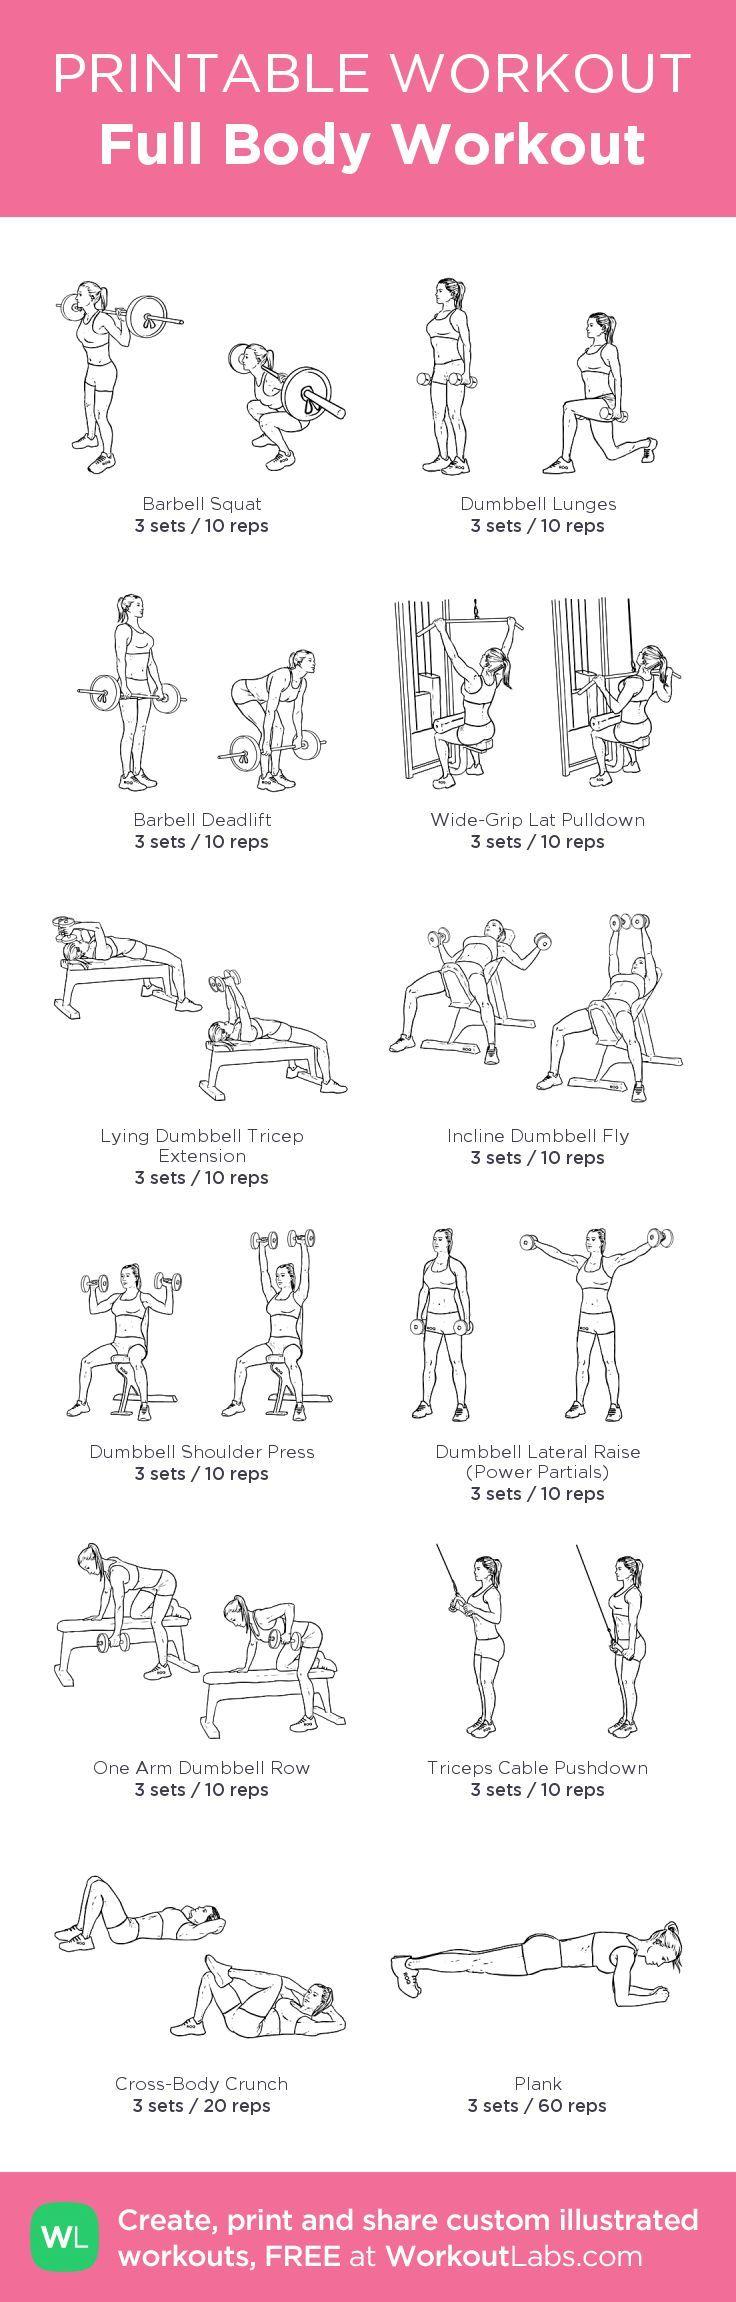 Full Body Workout: My Custom Printable Workout@workoutlabs - Free Printable Gym Workout Routines